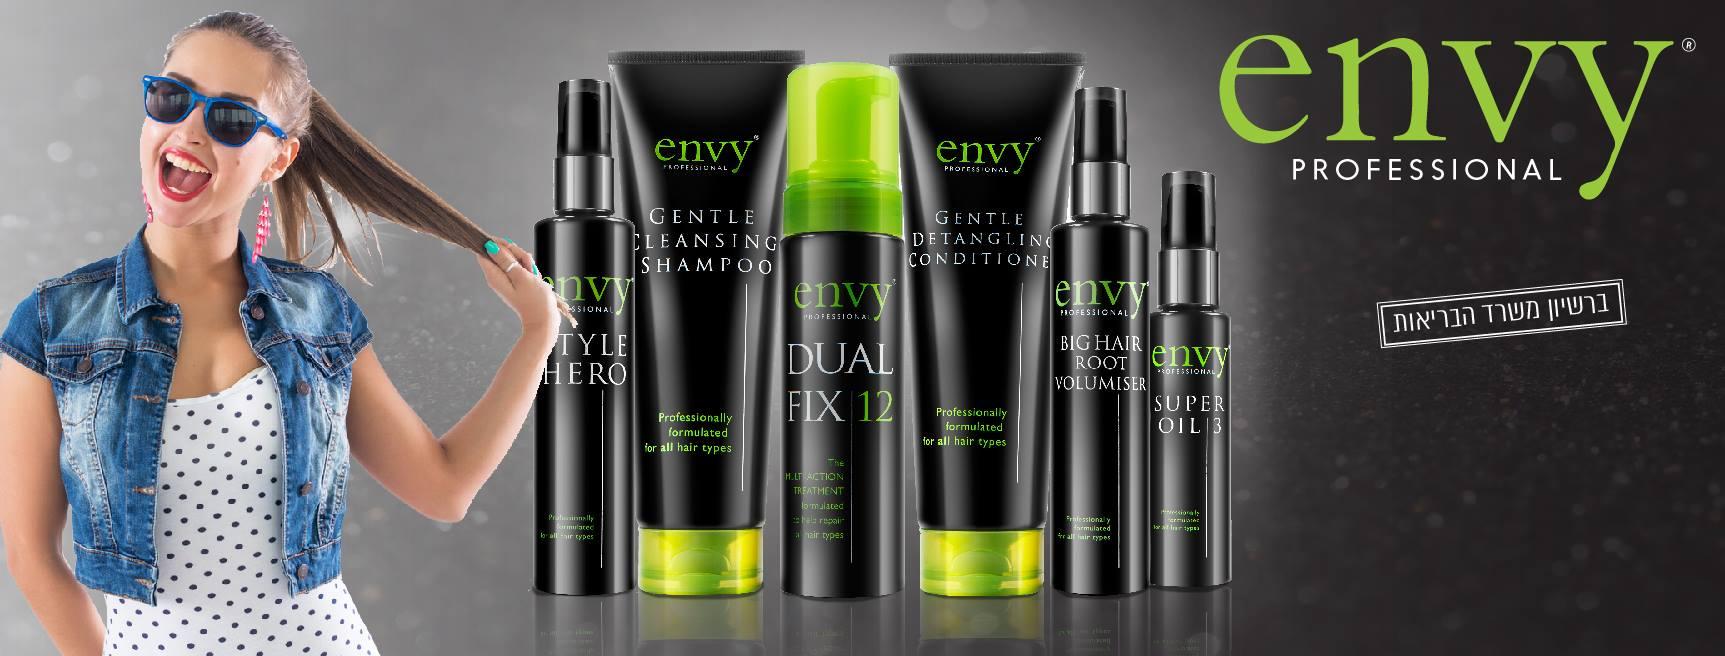 מוצרי ENVY PROFESSIONAL